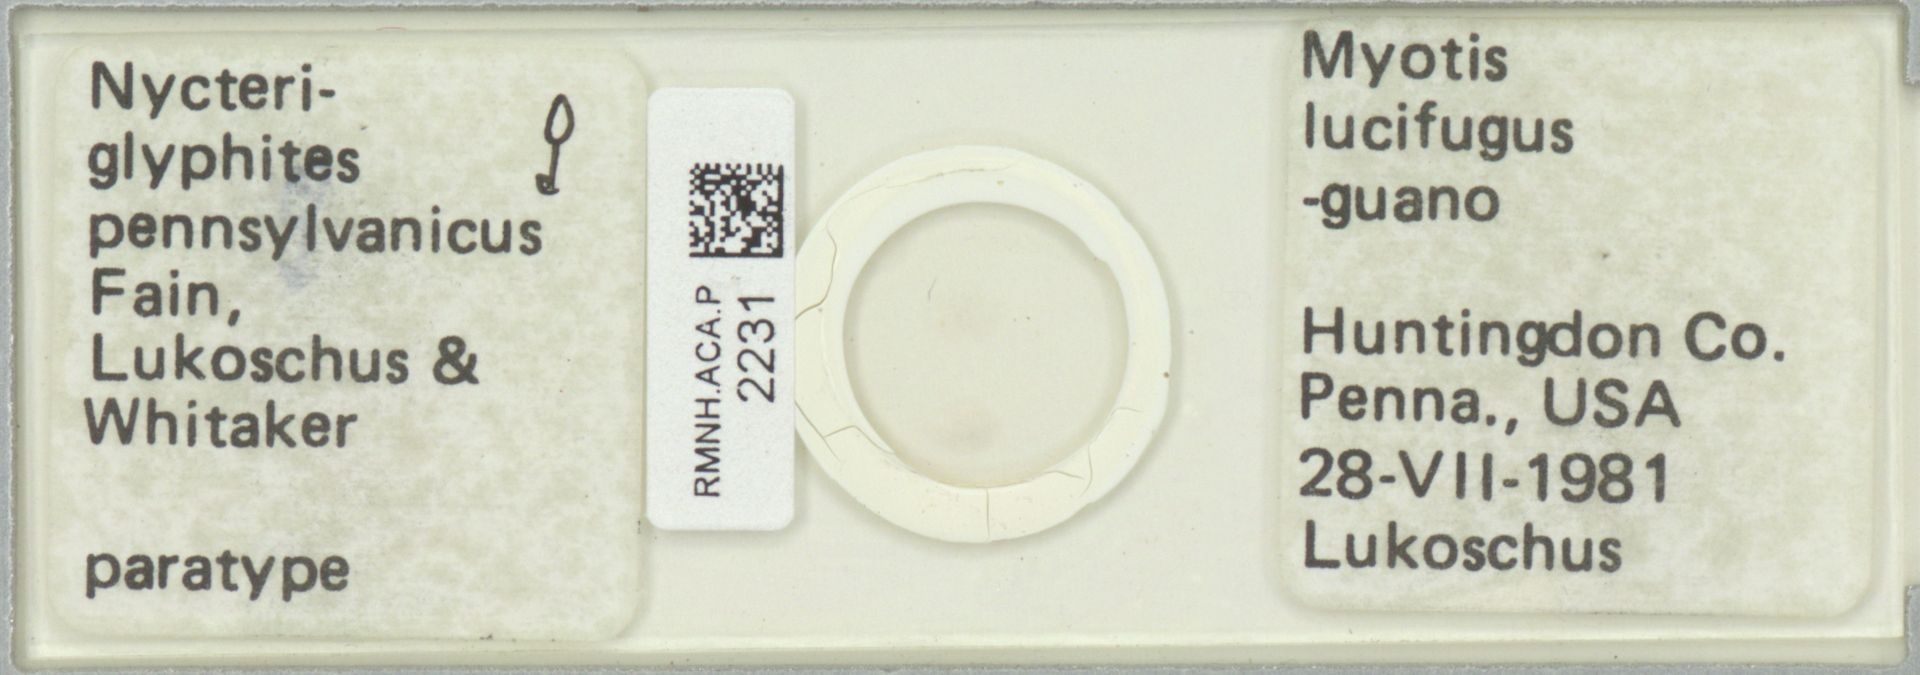 RMNH.ACA.P.2231   Nycteroglyphites pennsylvanicus Fain, Lukoschus & Whitaker